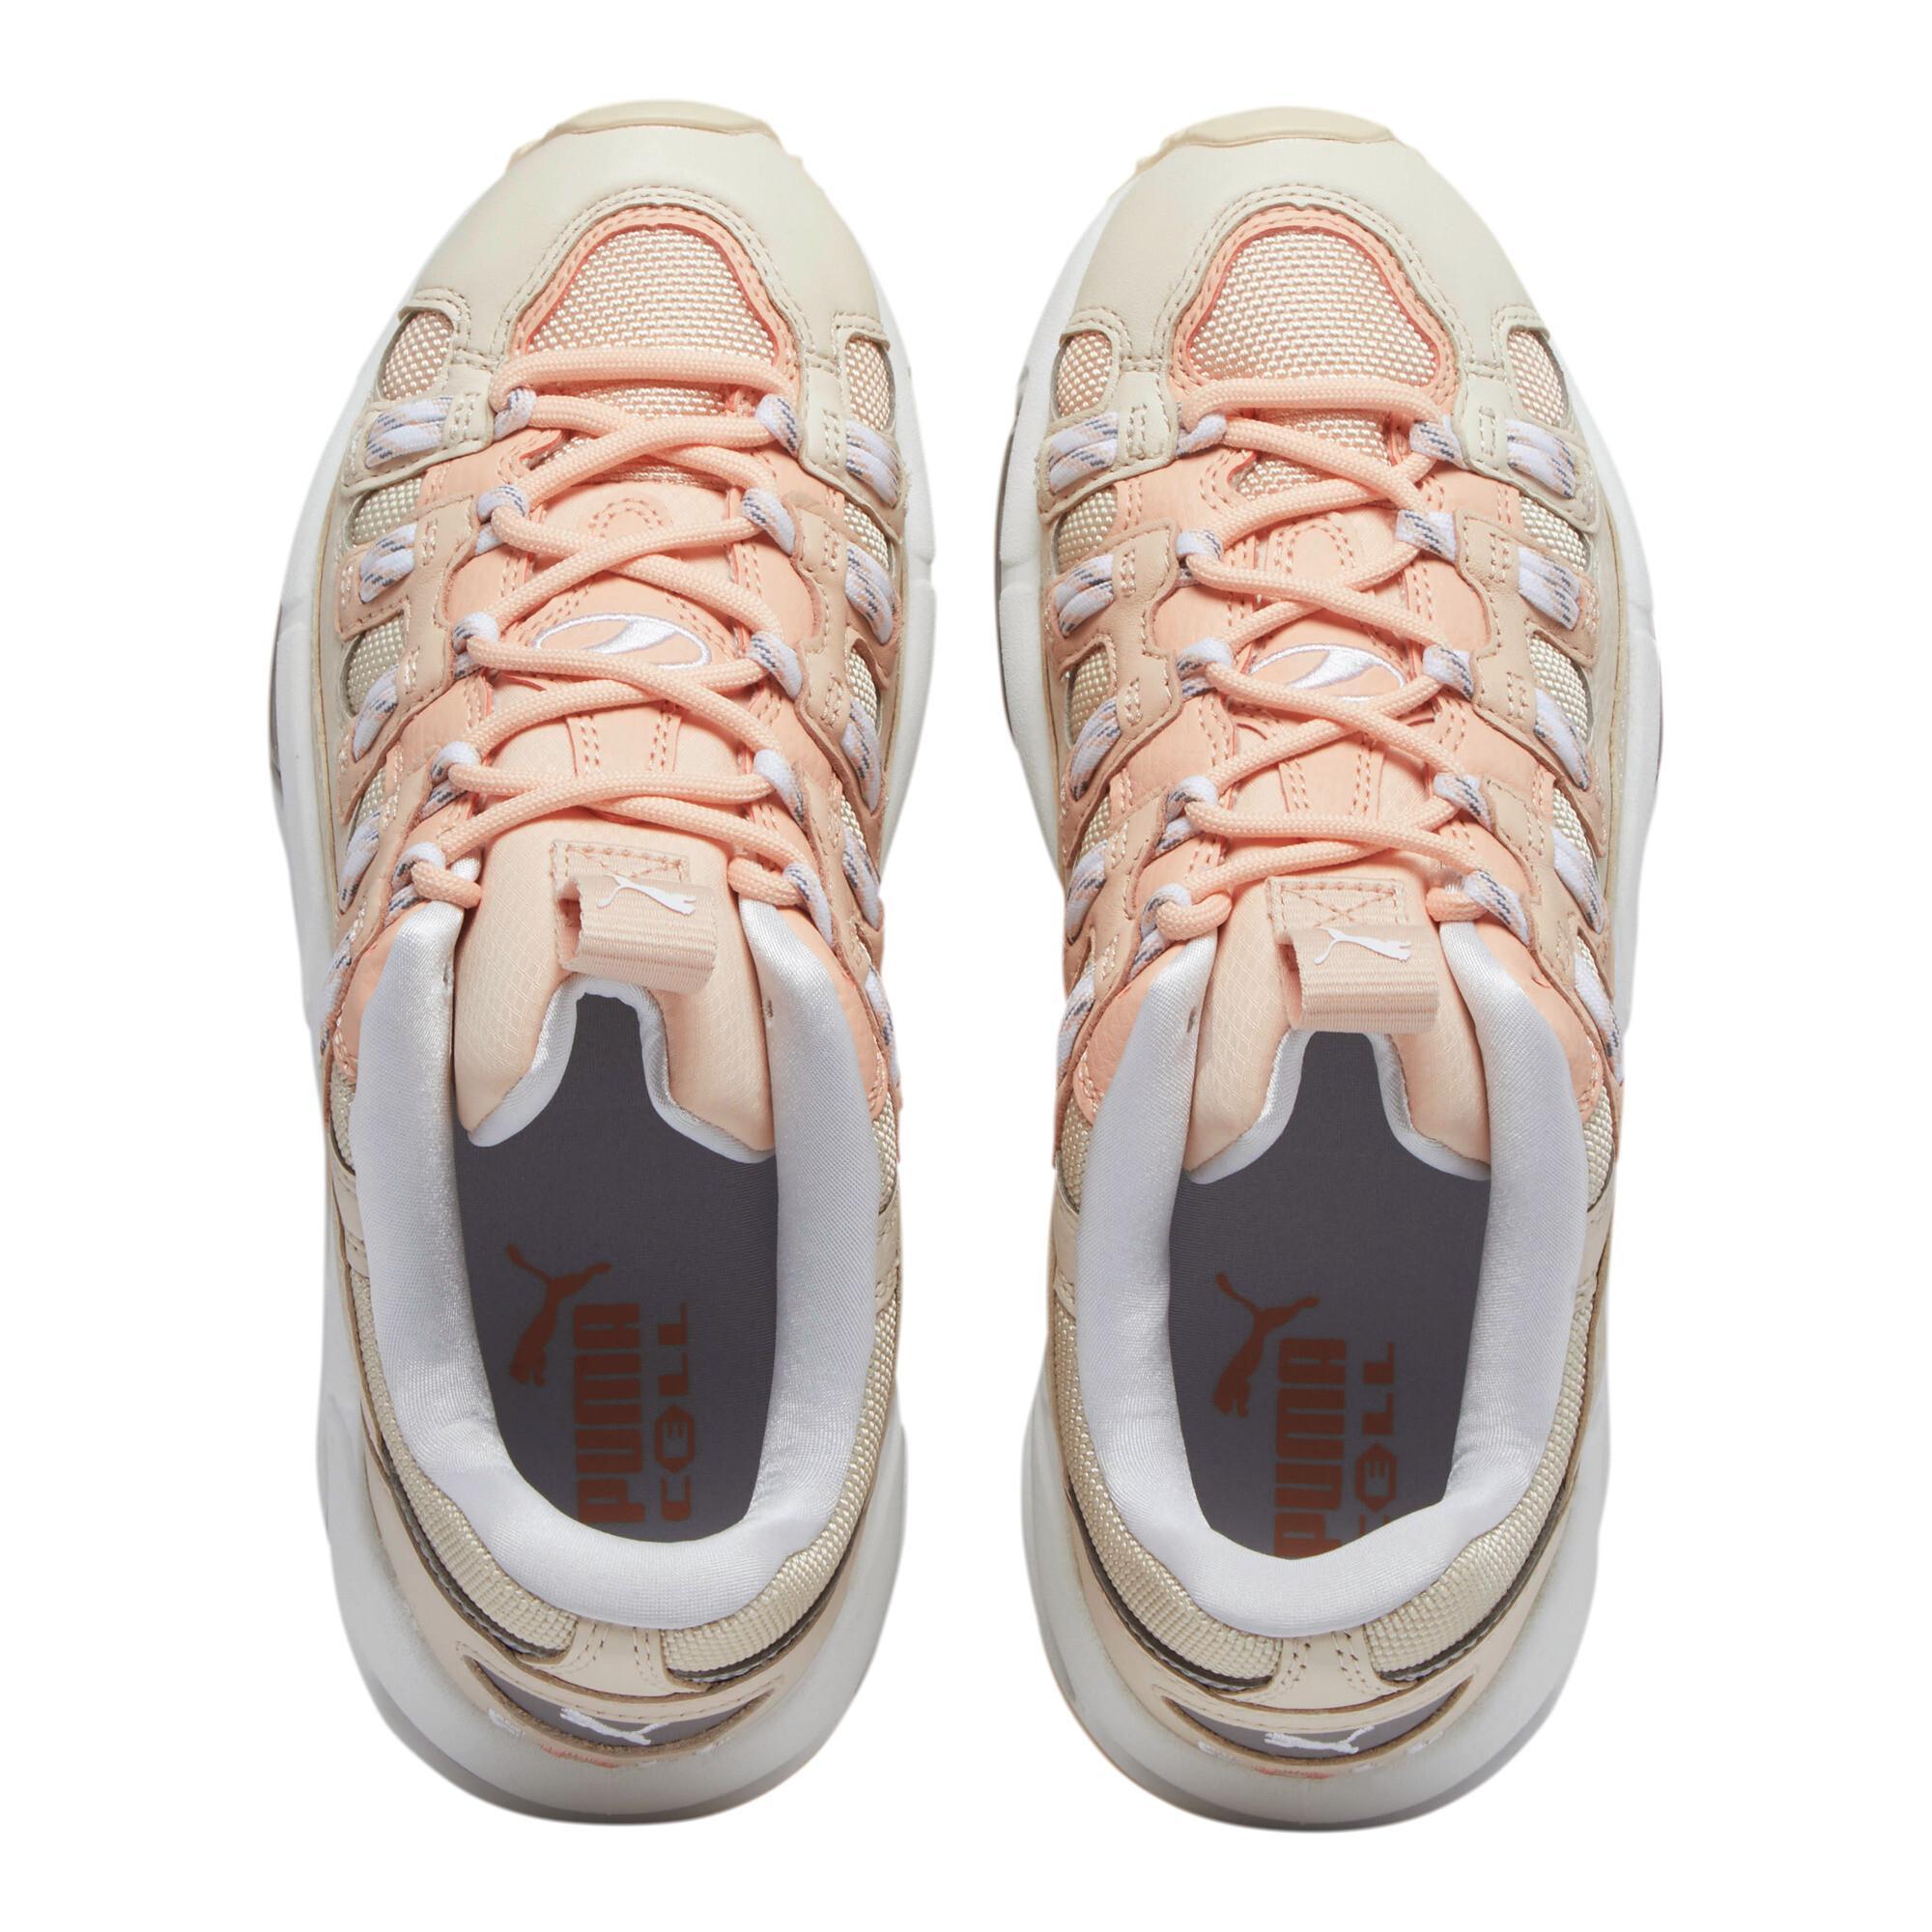 PUMA-CELL-Endura-Rebound-Women-039-s-Sneakers-Women-Shoe-Sport-Classics thumbnail 13